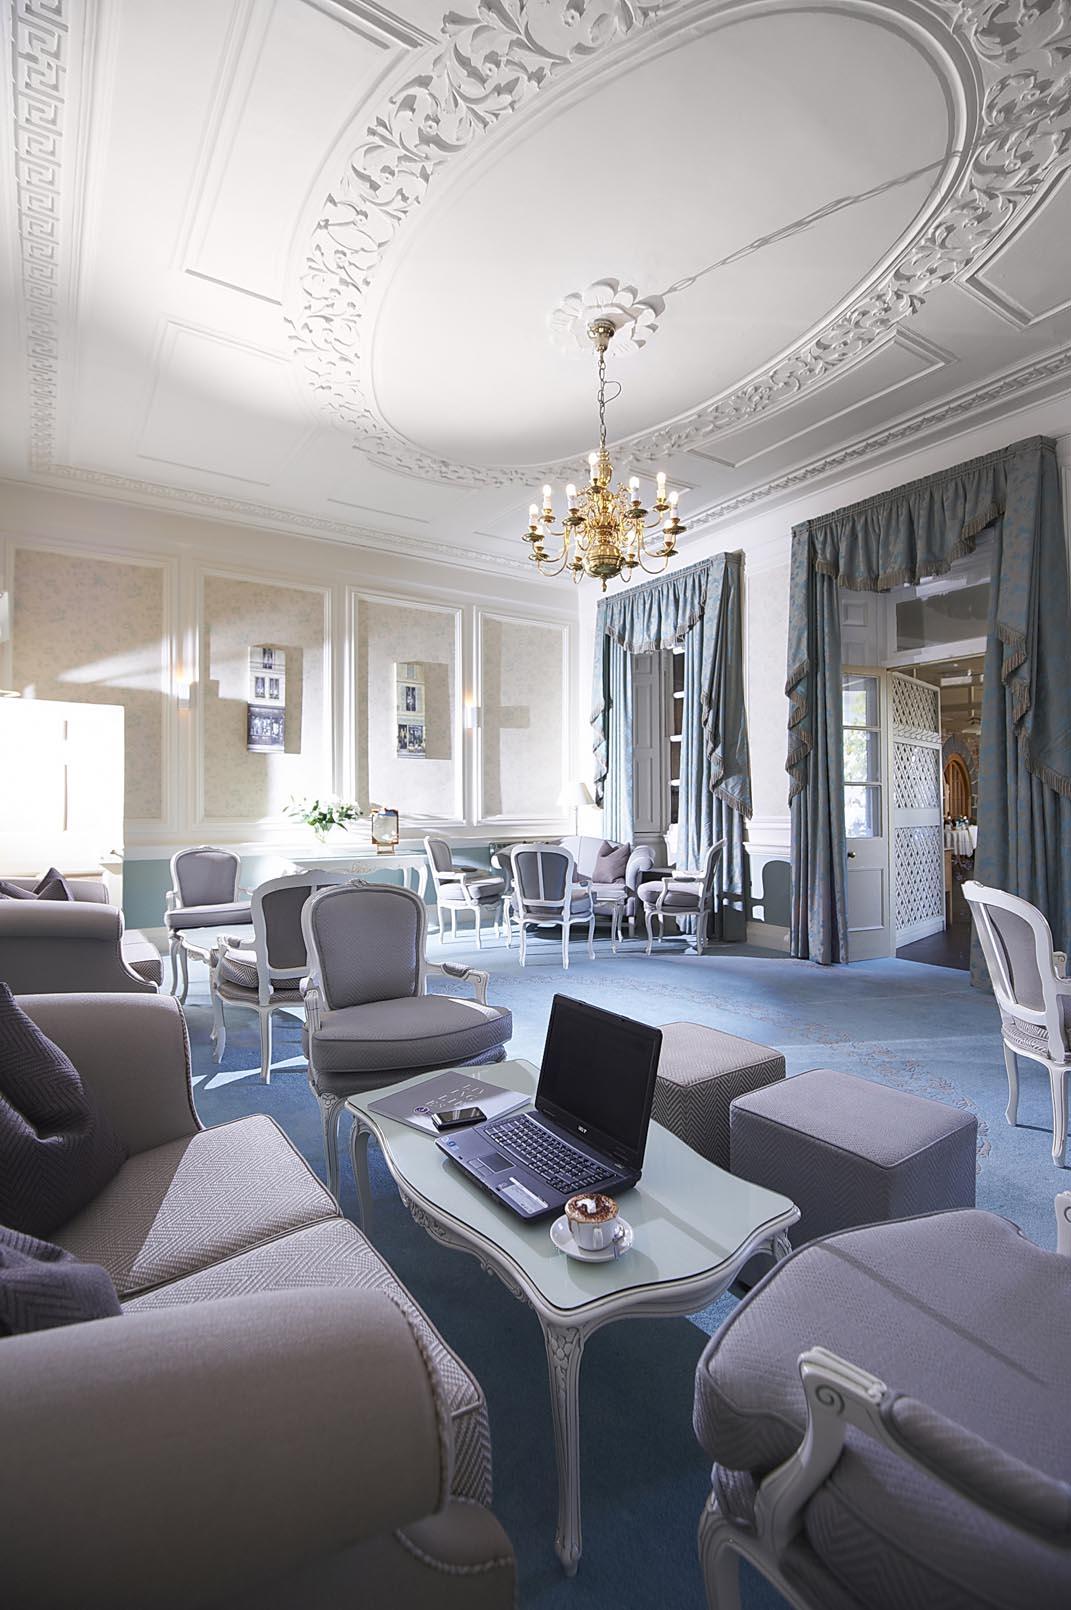 Best Western Hotel Room: Best Western Moores Central Hotel